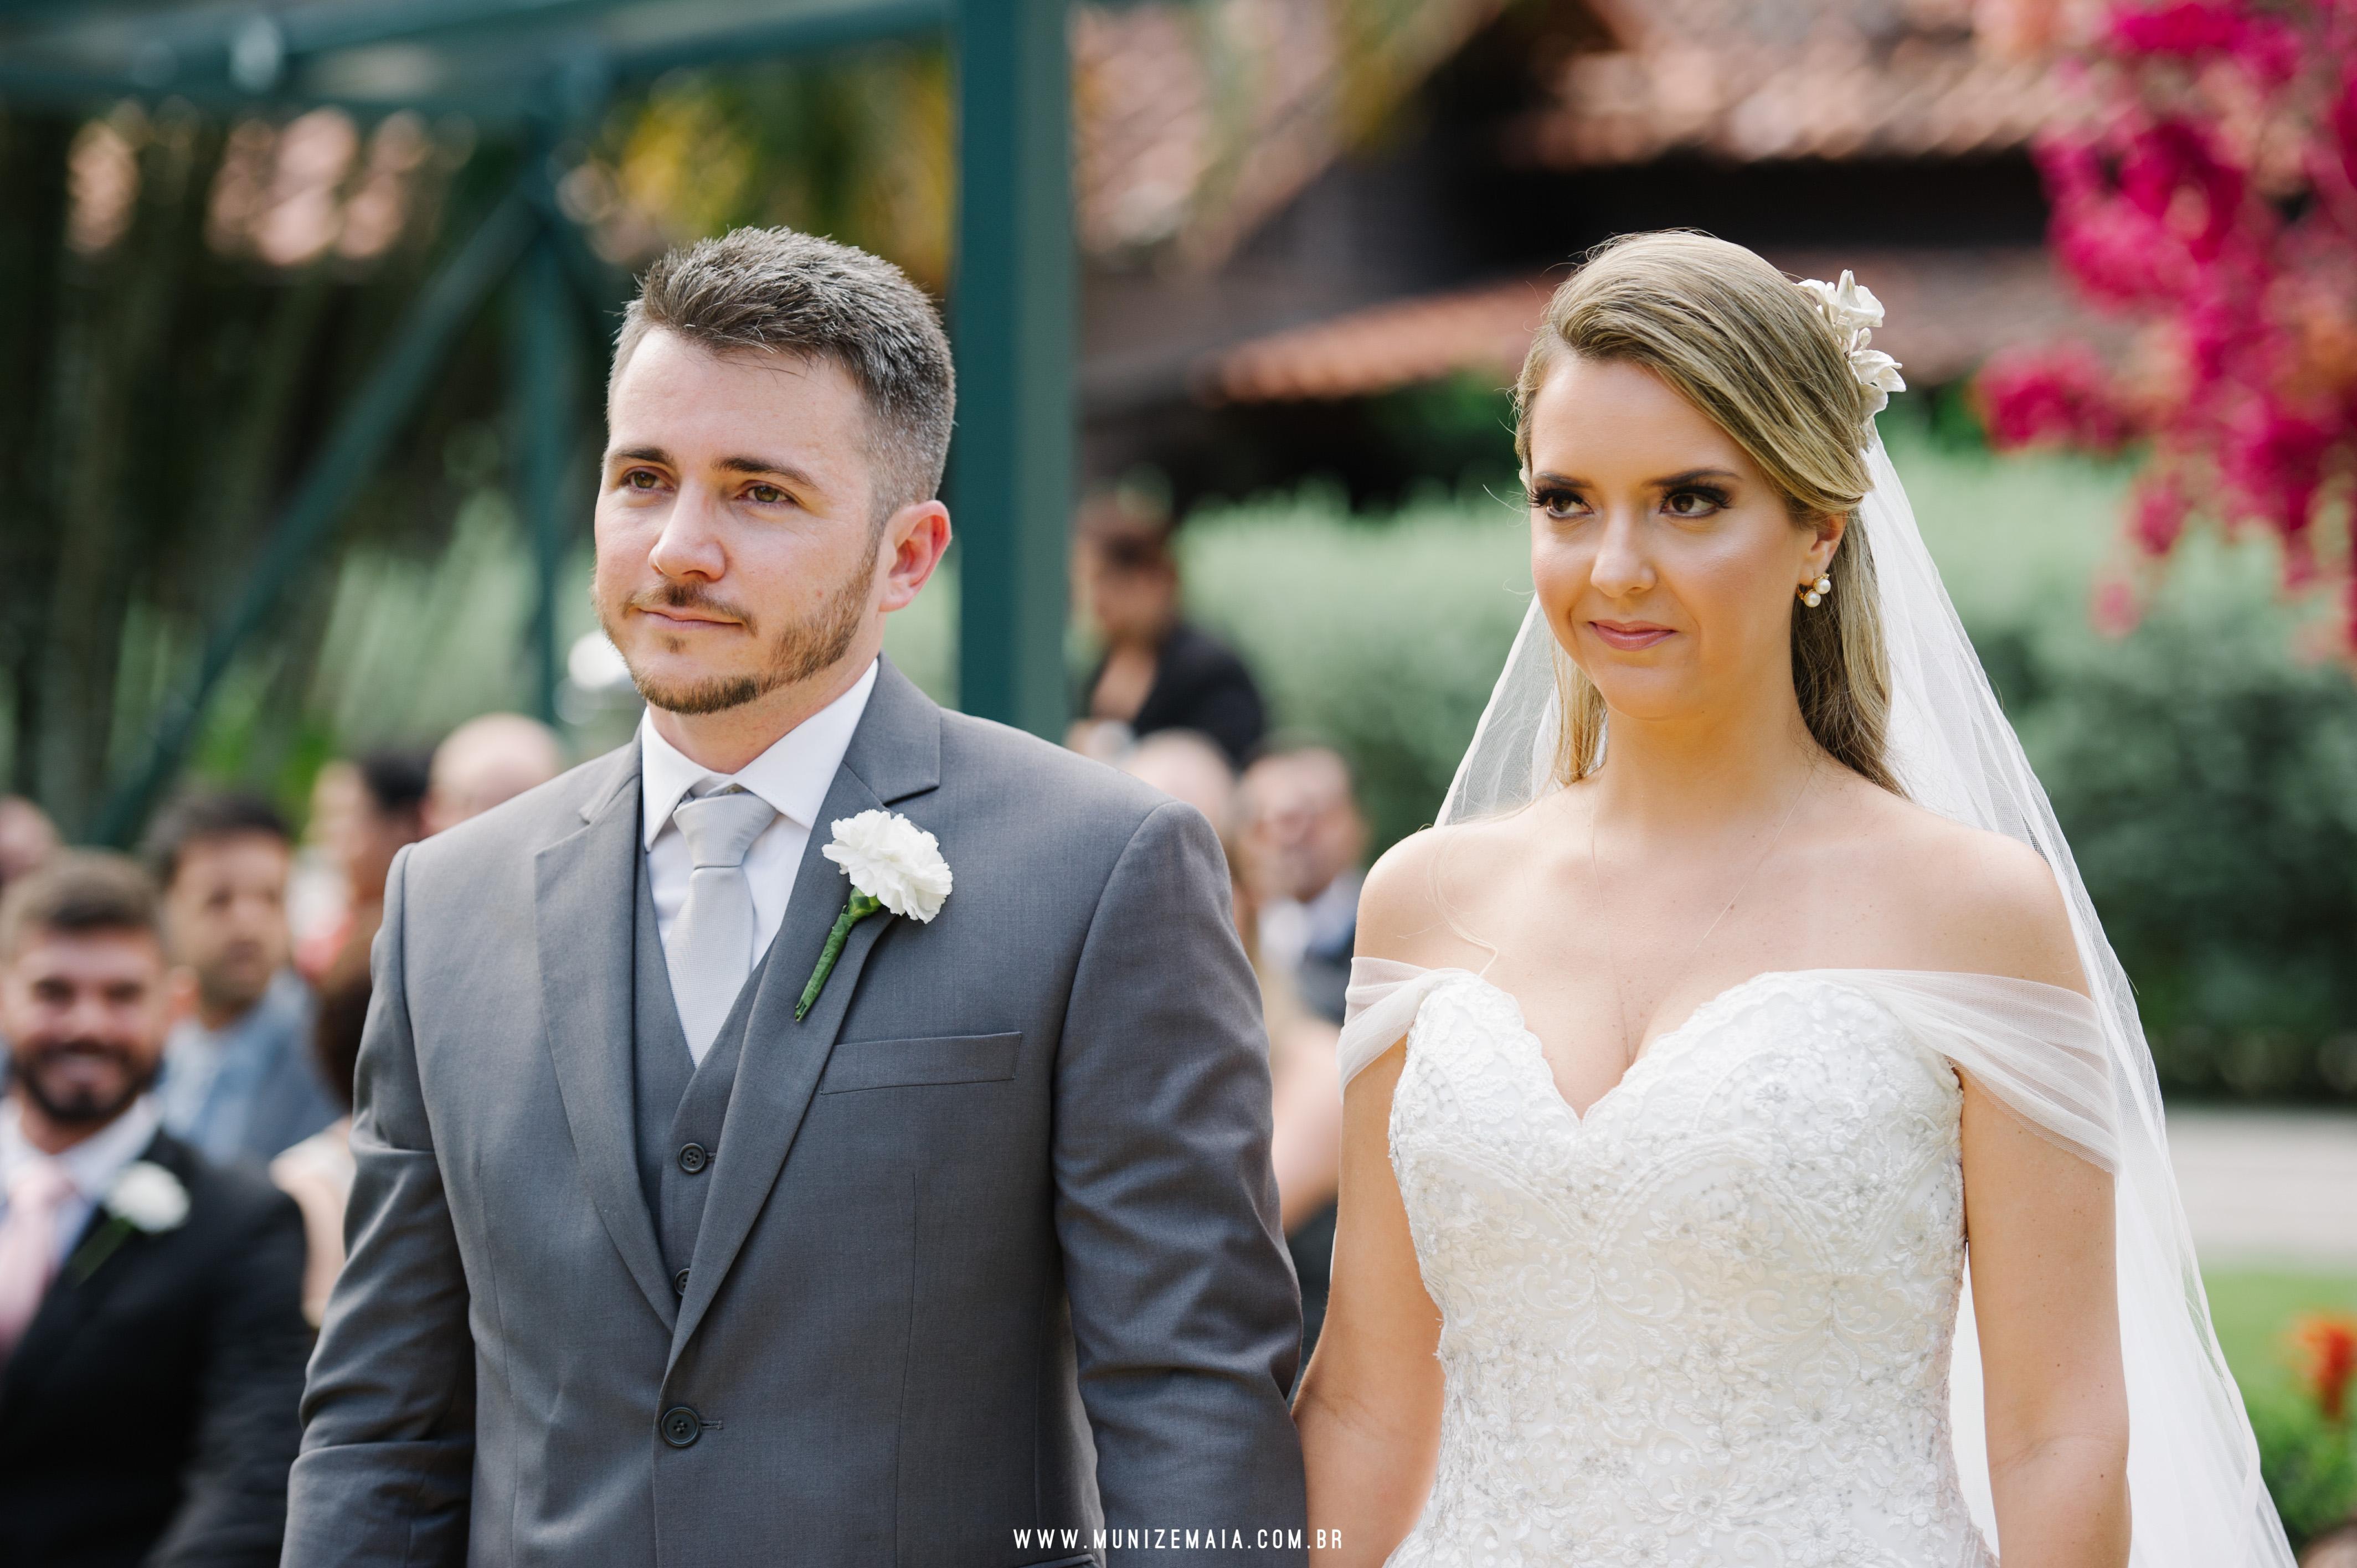 Casamento Romântico de Dia | Noiva Internovias Fernanda